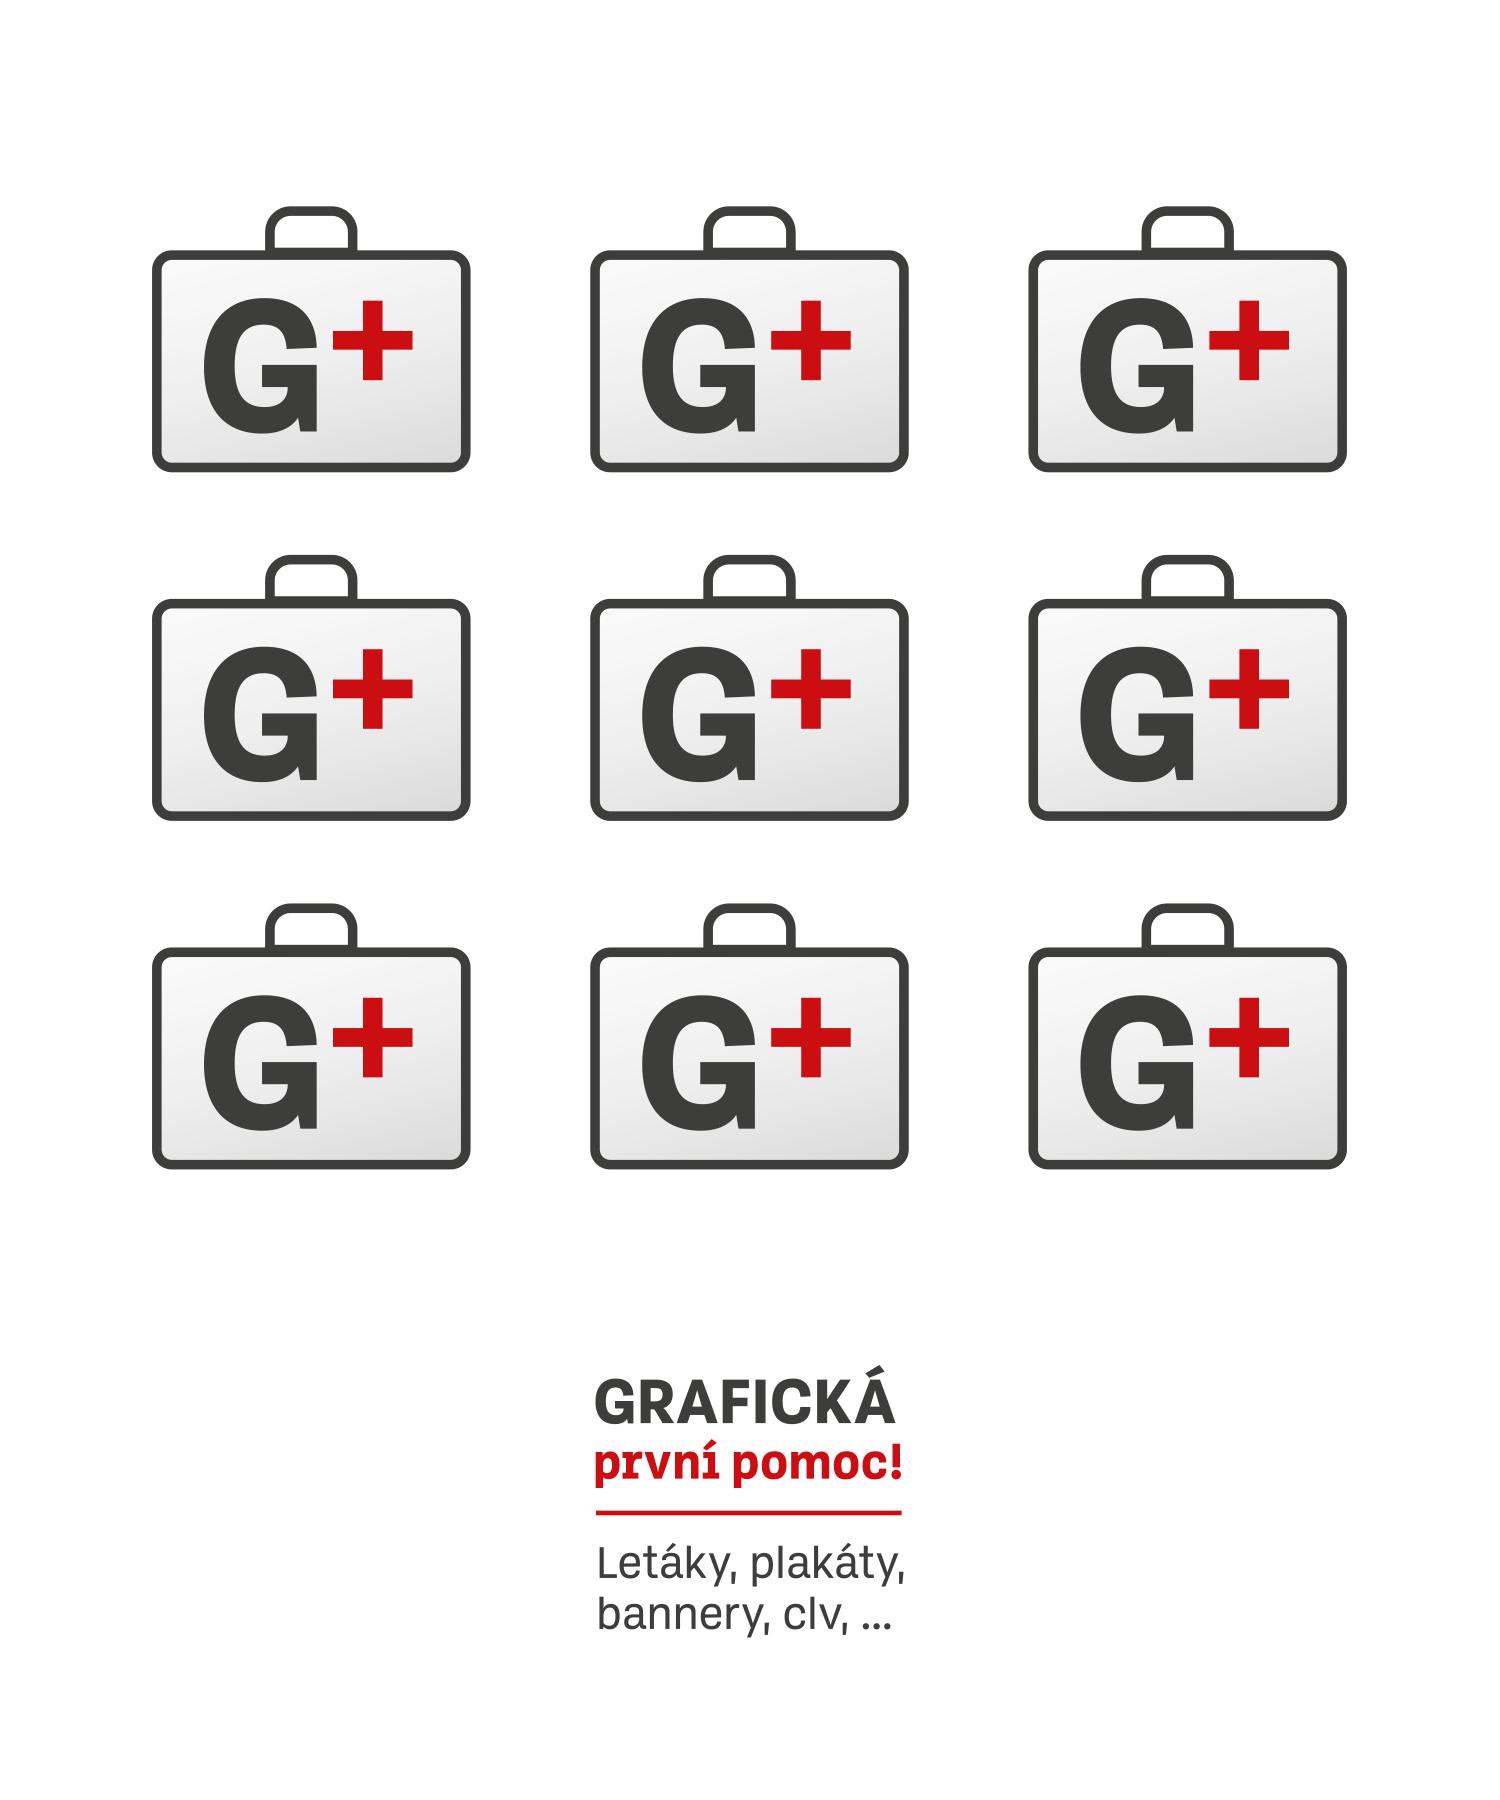 [album/Products_Model_Product/113/graficka_prvni_pomoc_content_2.png]